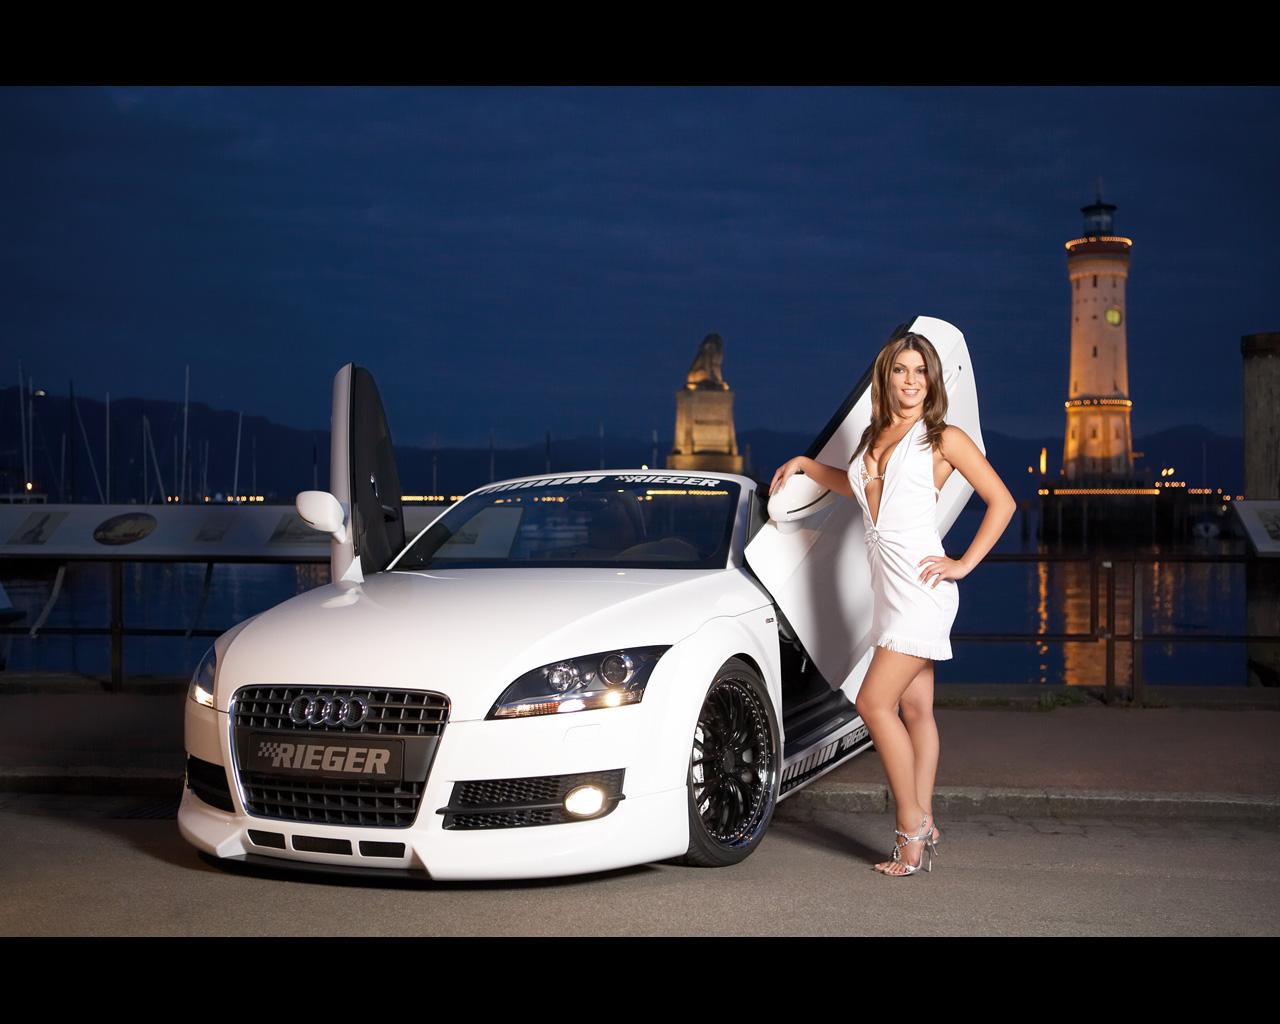 hot girls cars